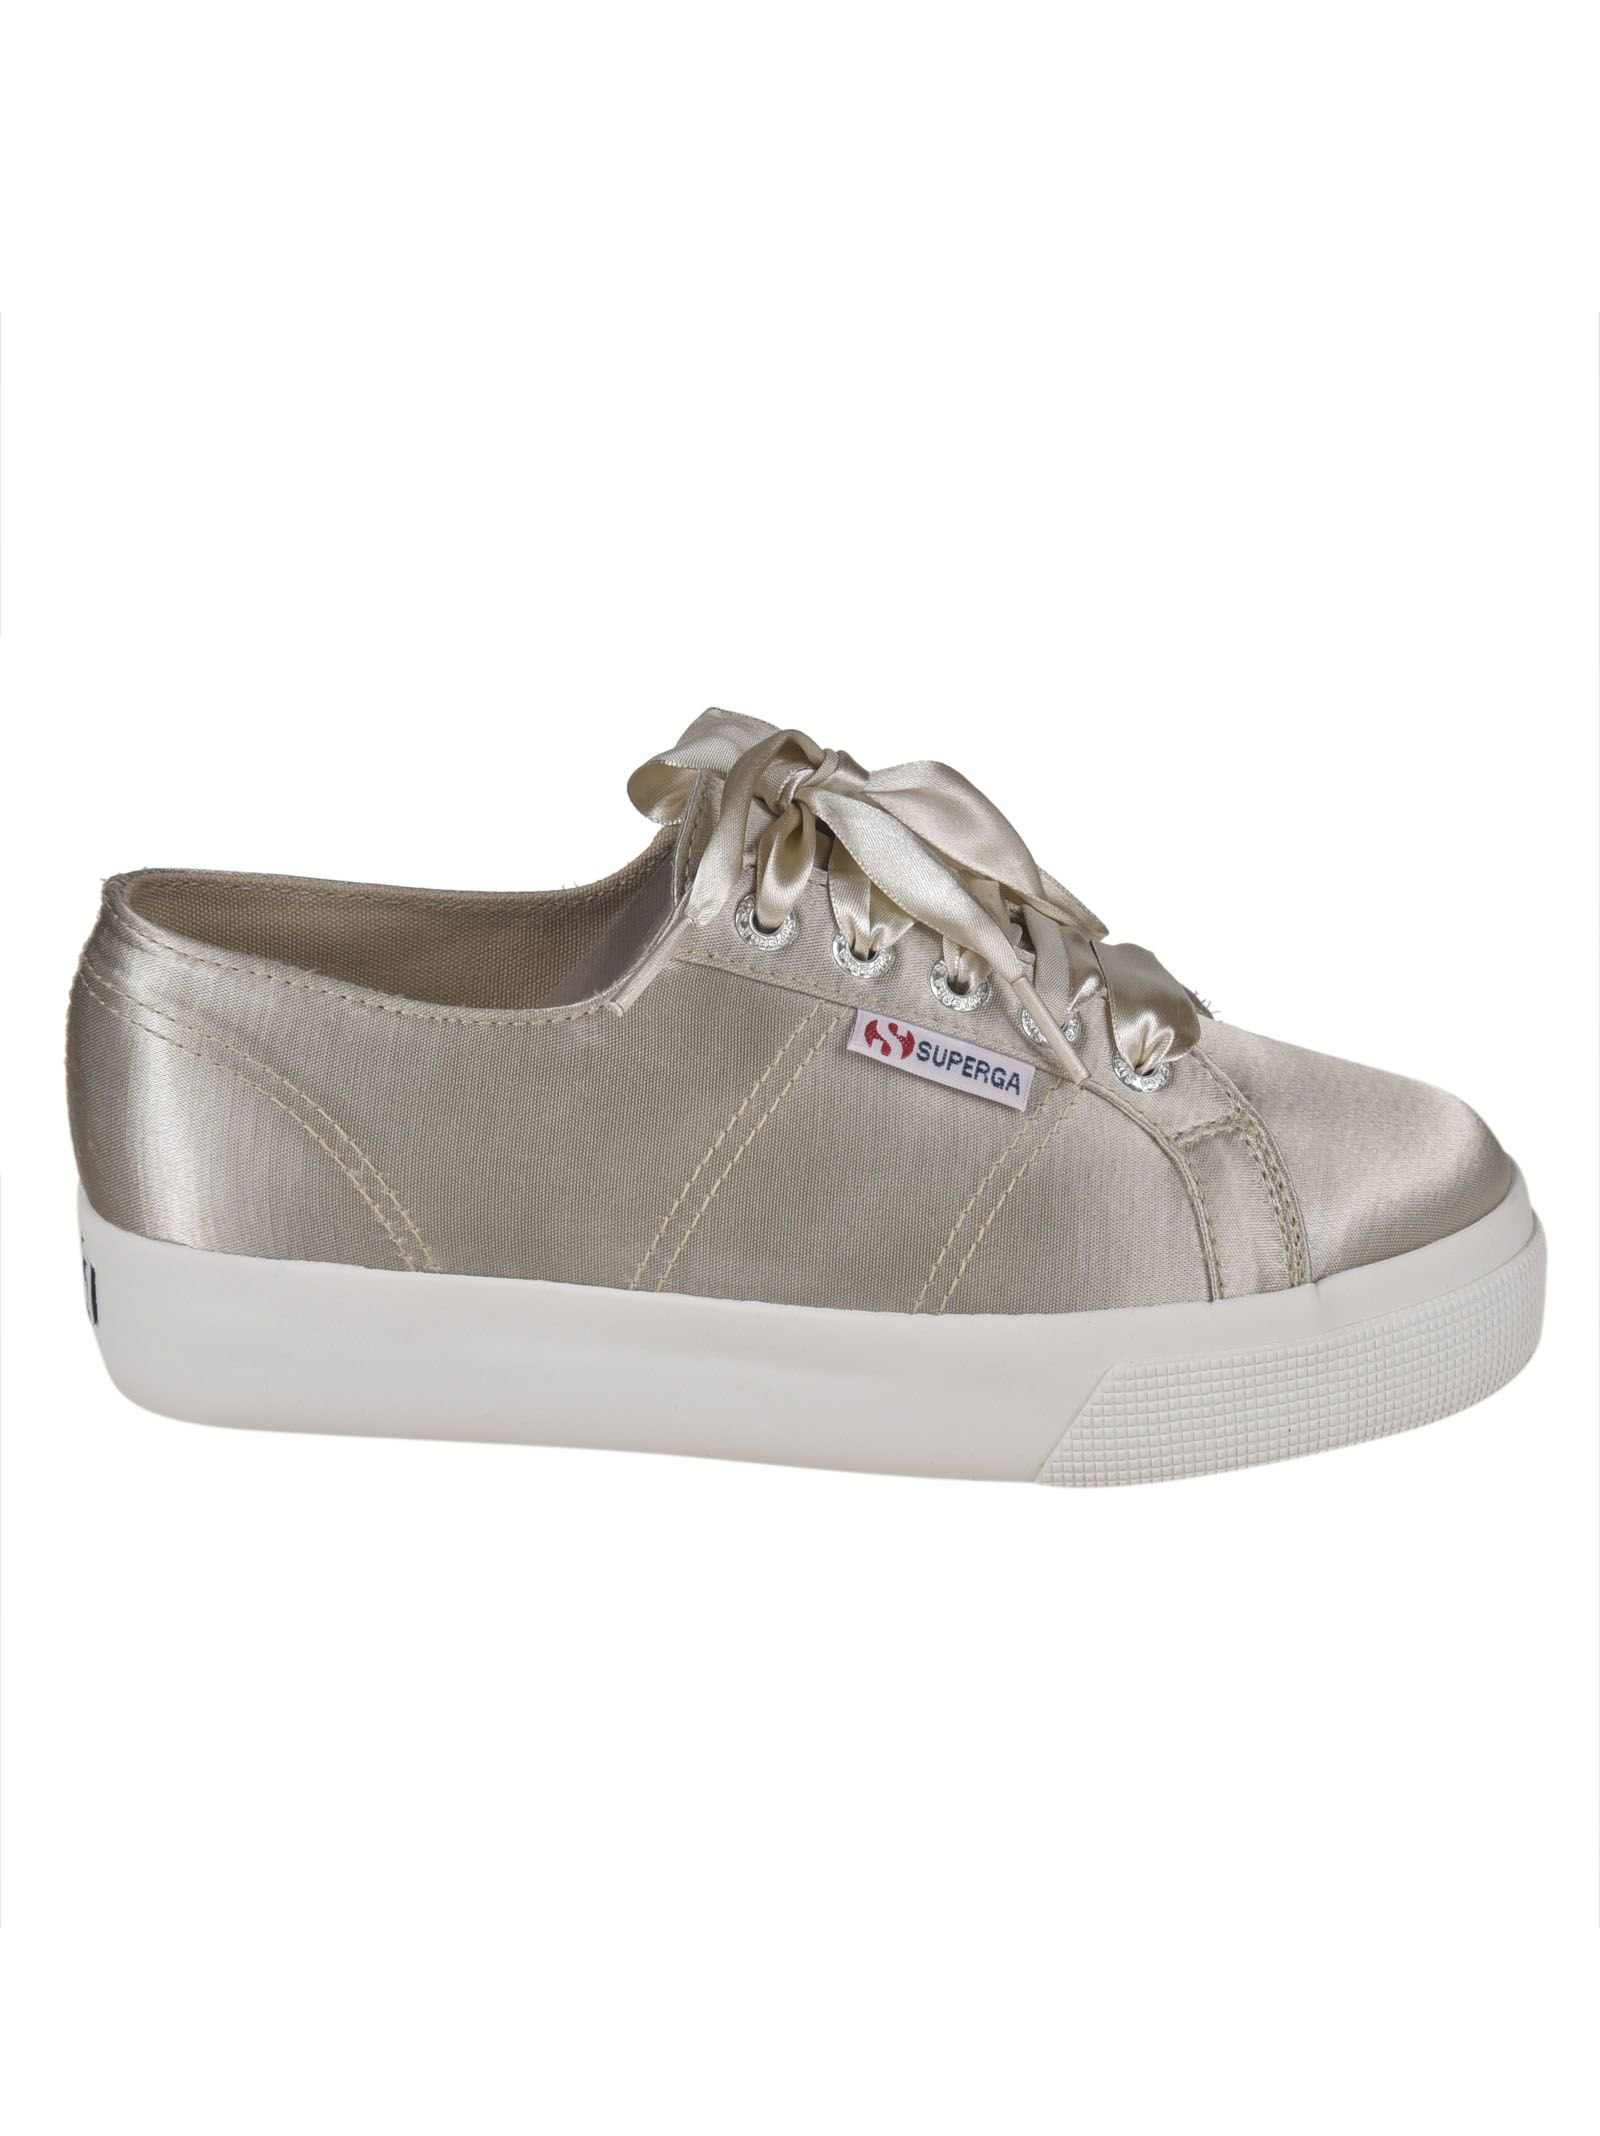 Superga Classic Platform Sneakers